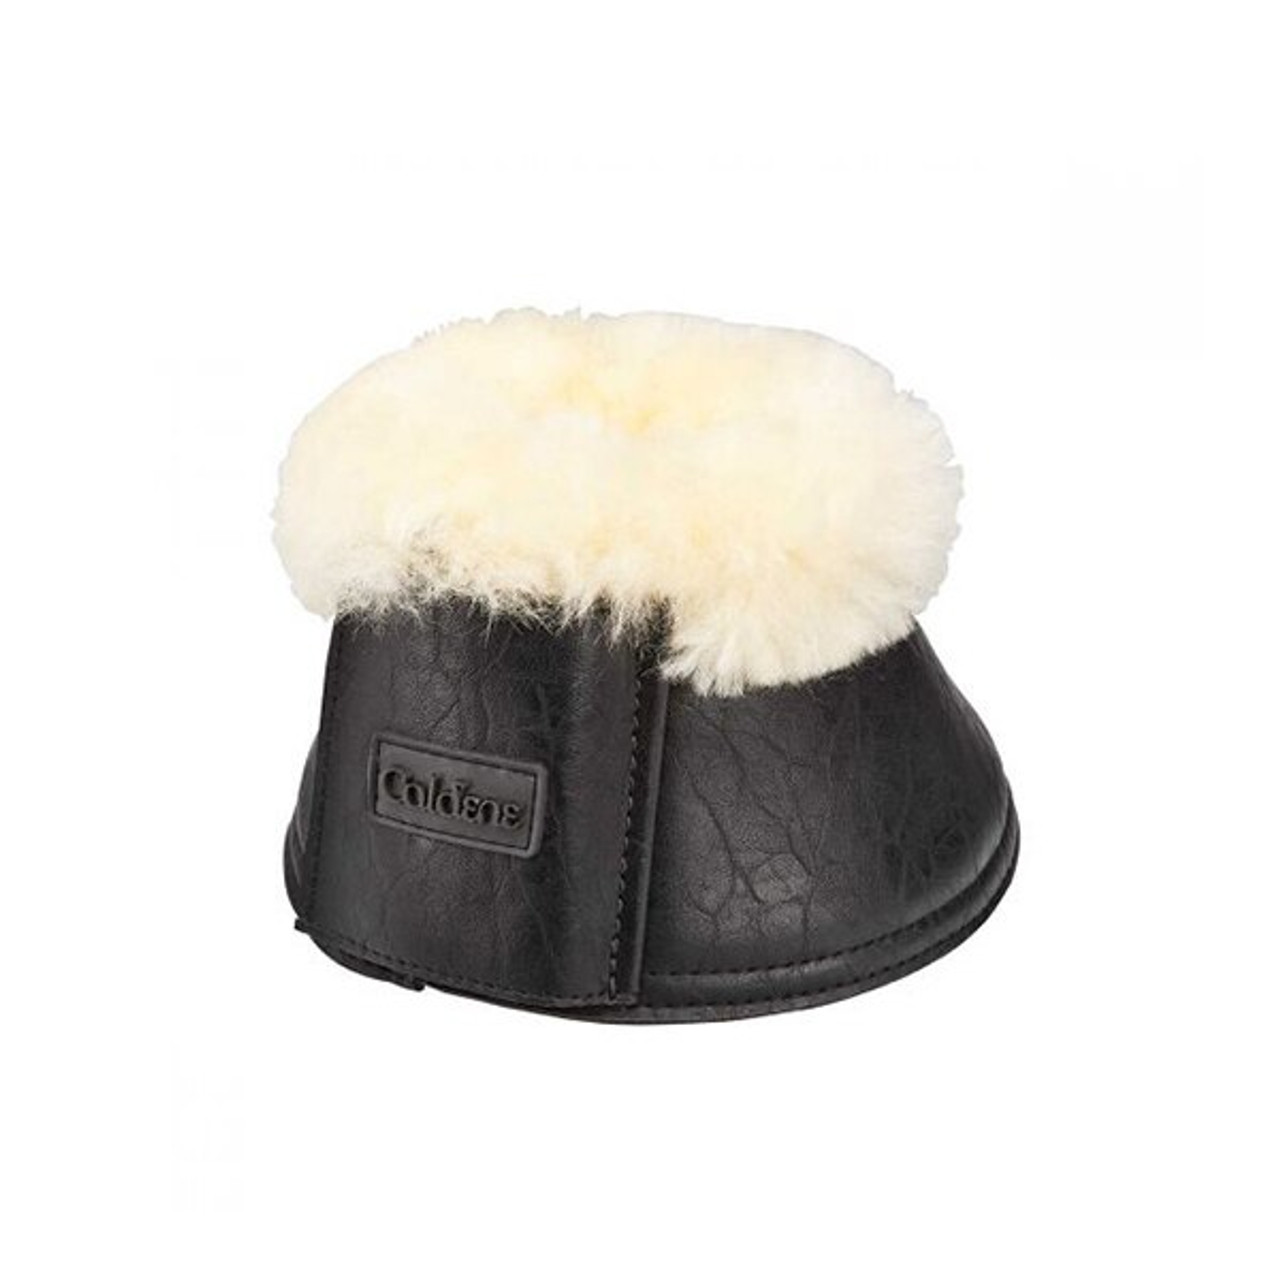 Rhinegold Sheepskin Trim Patent Over Reach Boots